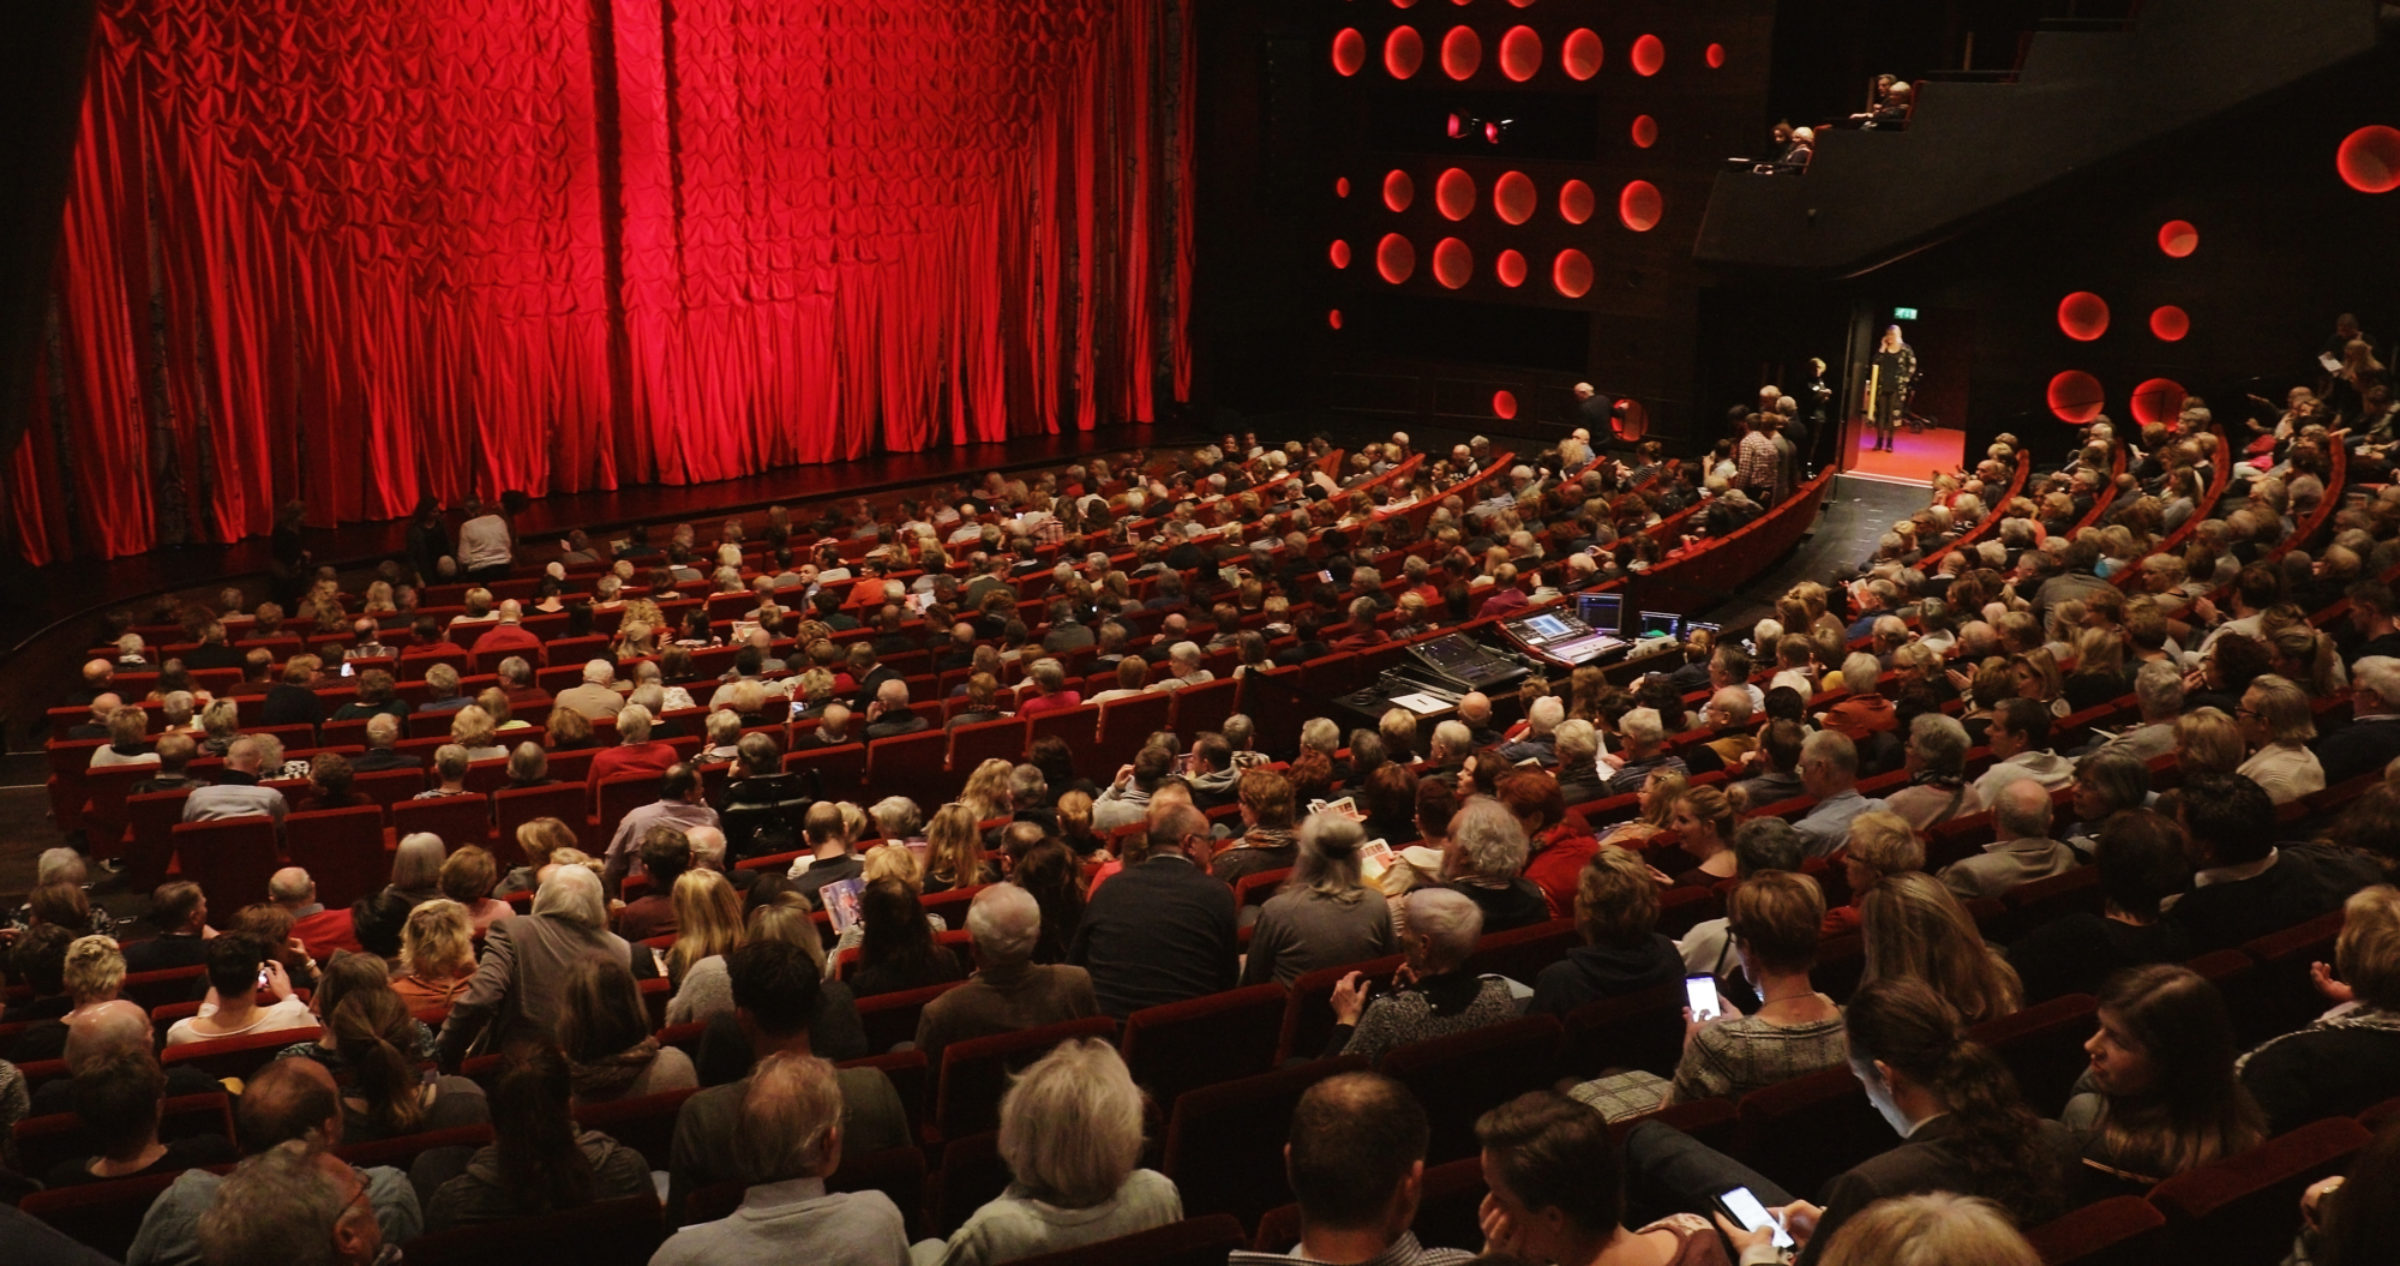 2018 Ebo Fraterman Wilminktheater Kunst En Cultuur